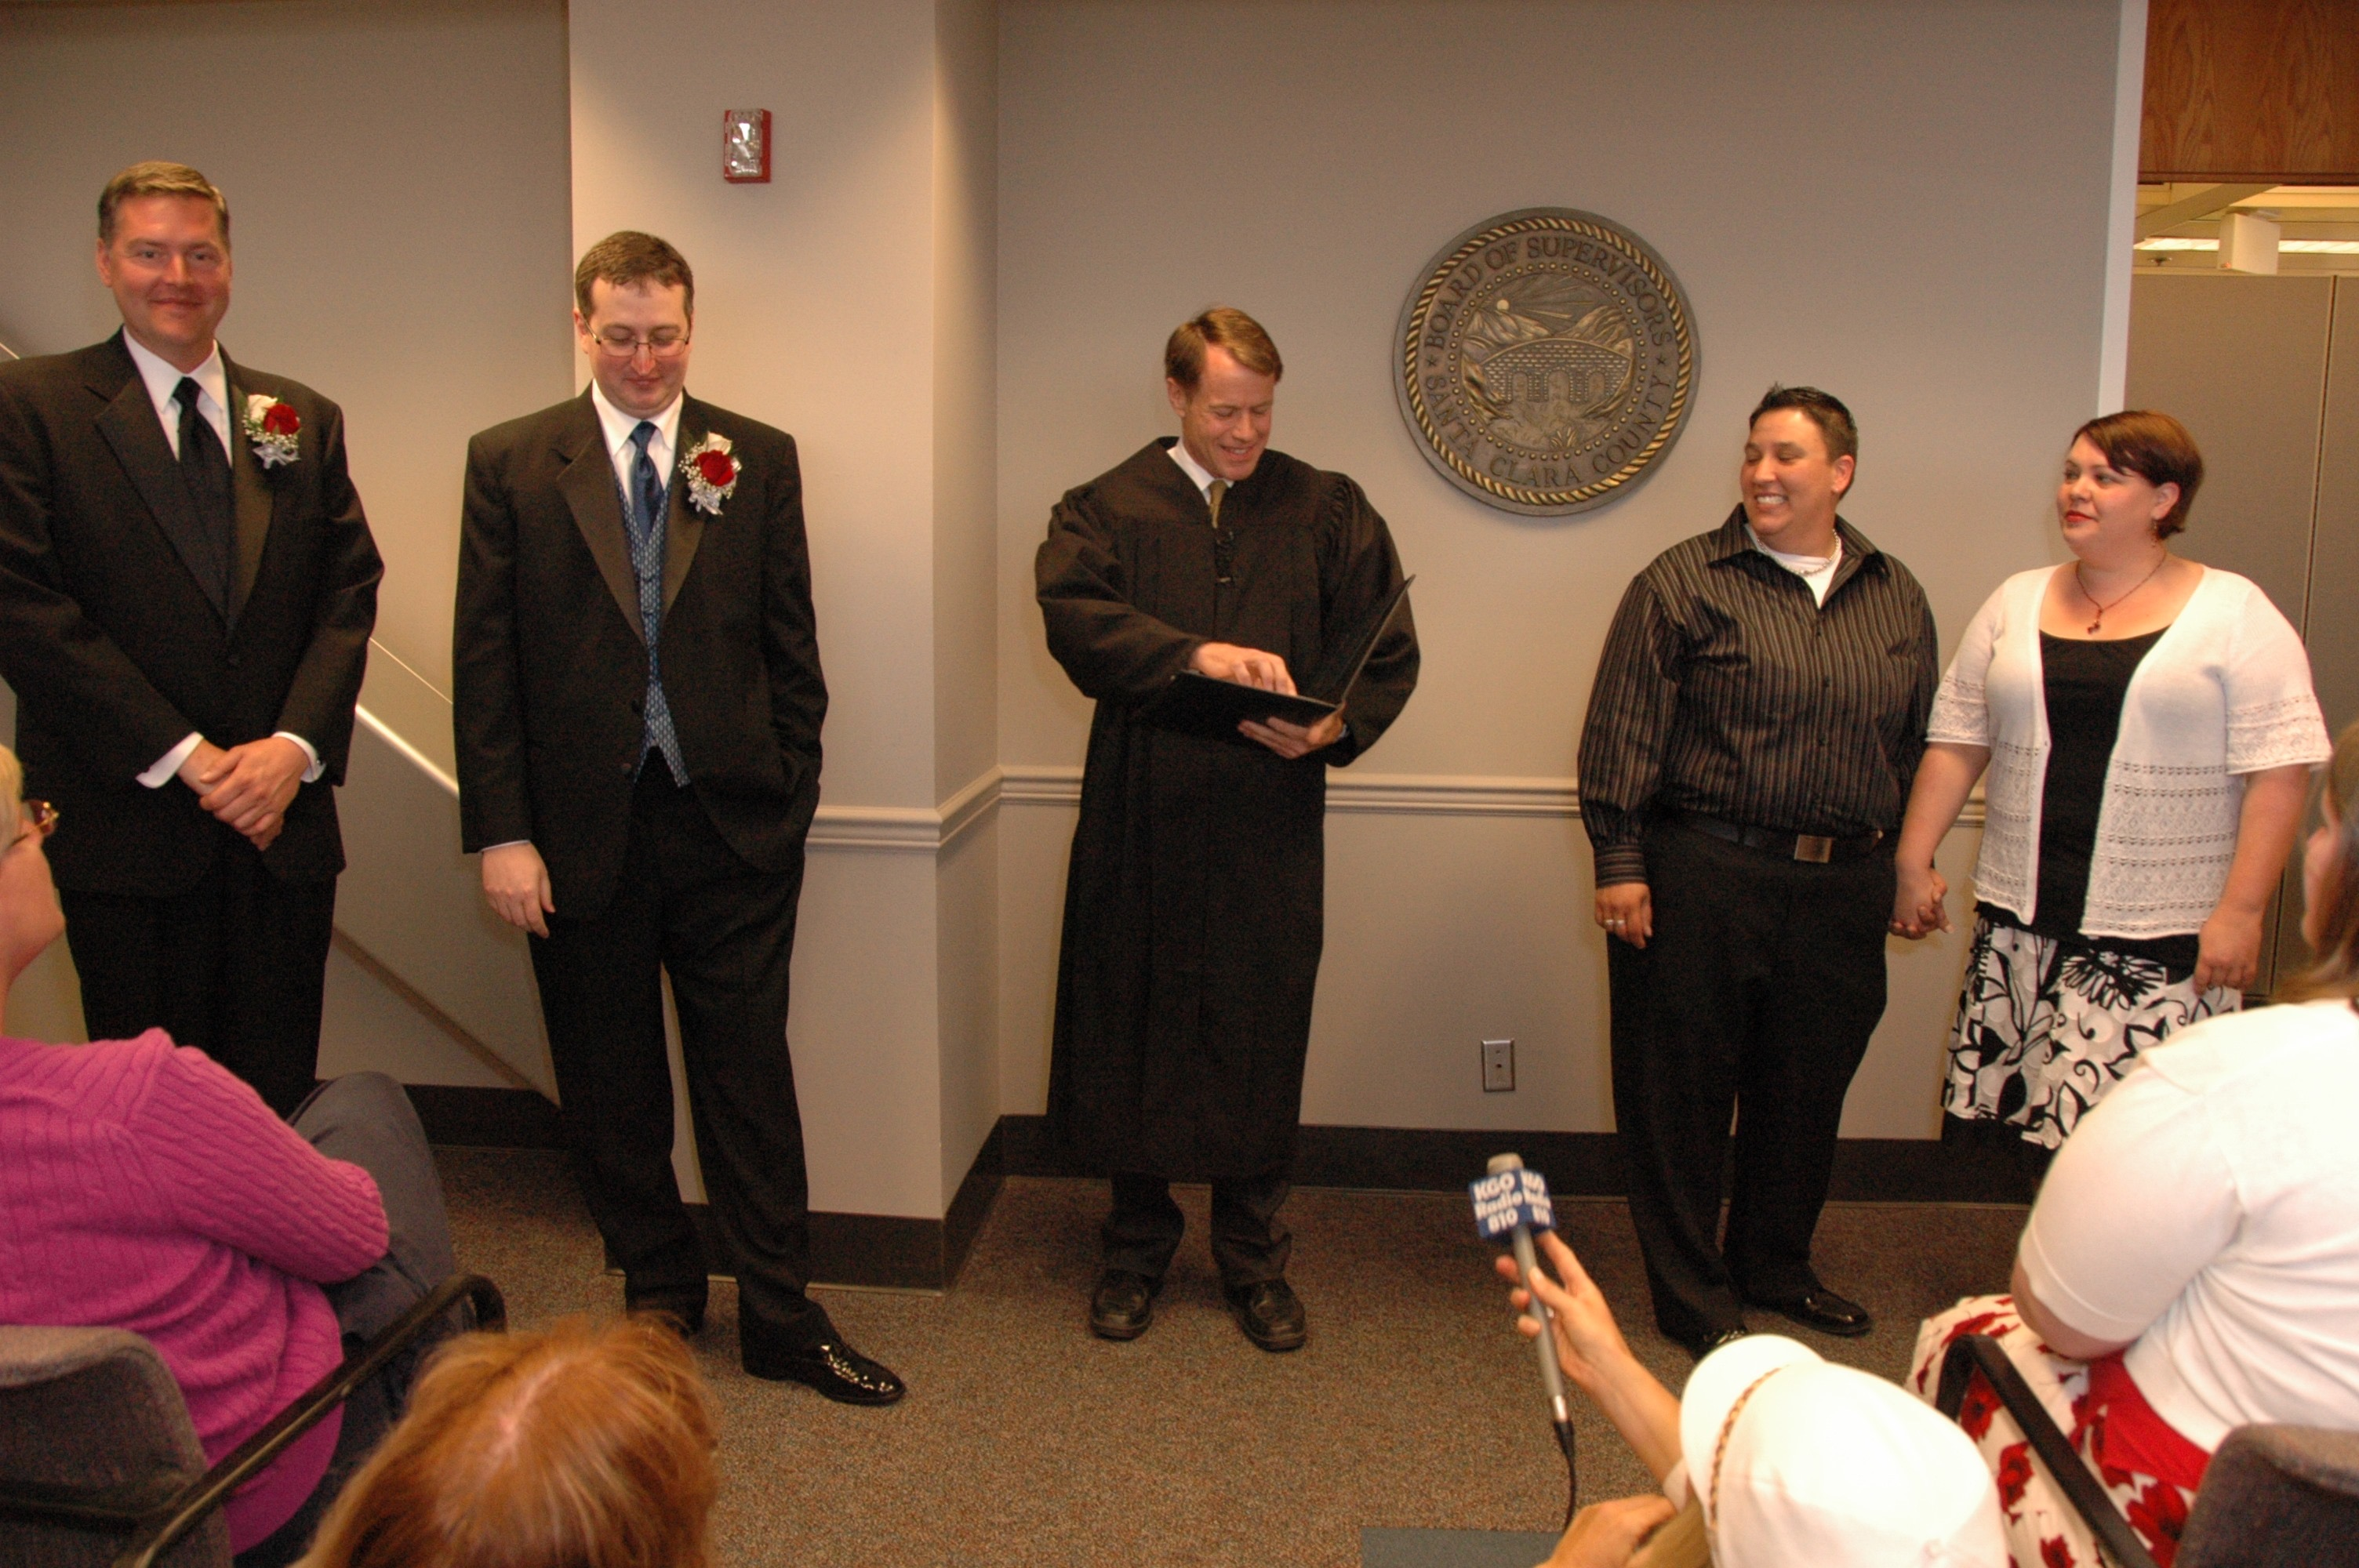 santa clara county first gay marriages